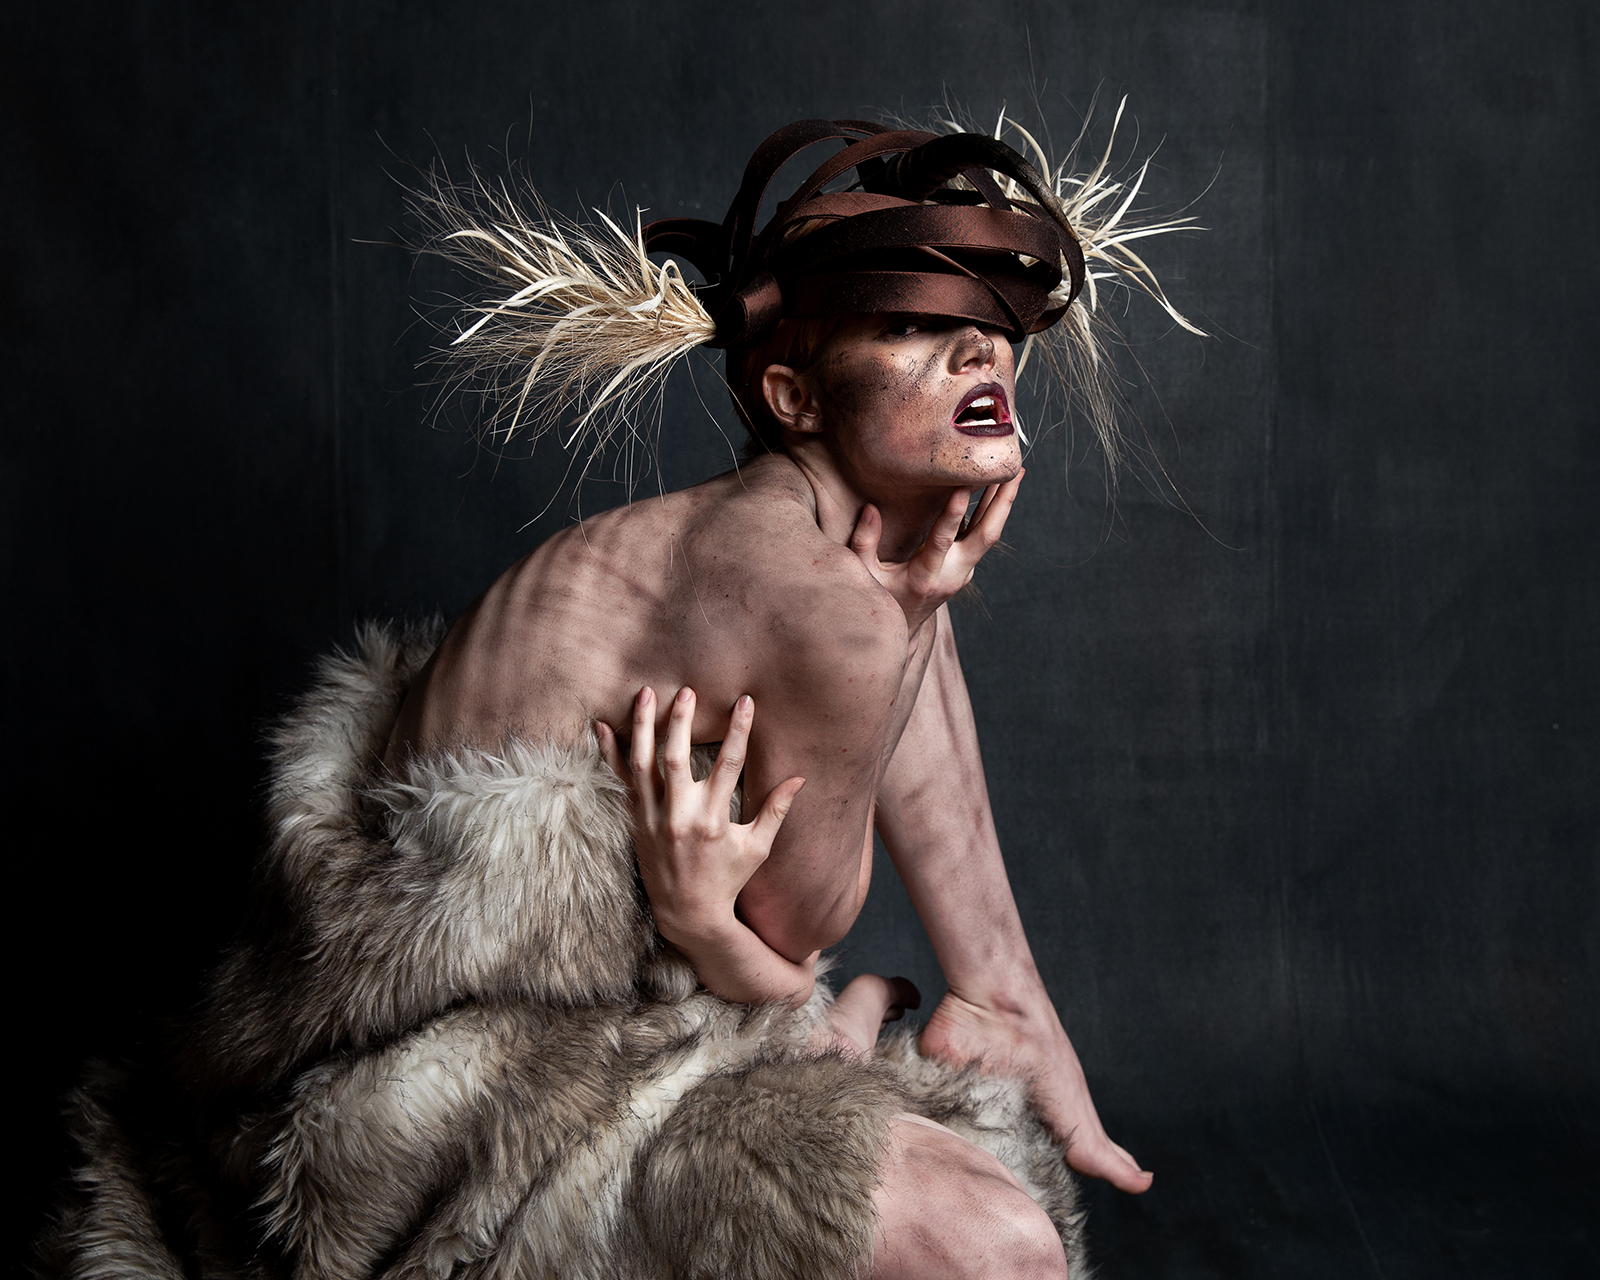 mark_and_naomi_toronto_fashion_photography_david_dunkley_dirty_horn_ii.jpg